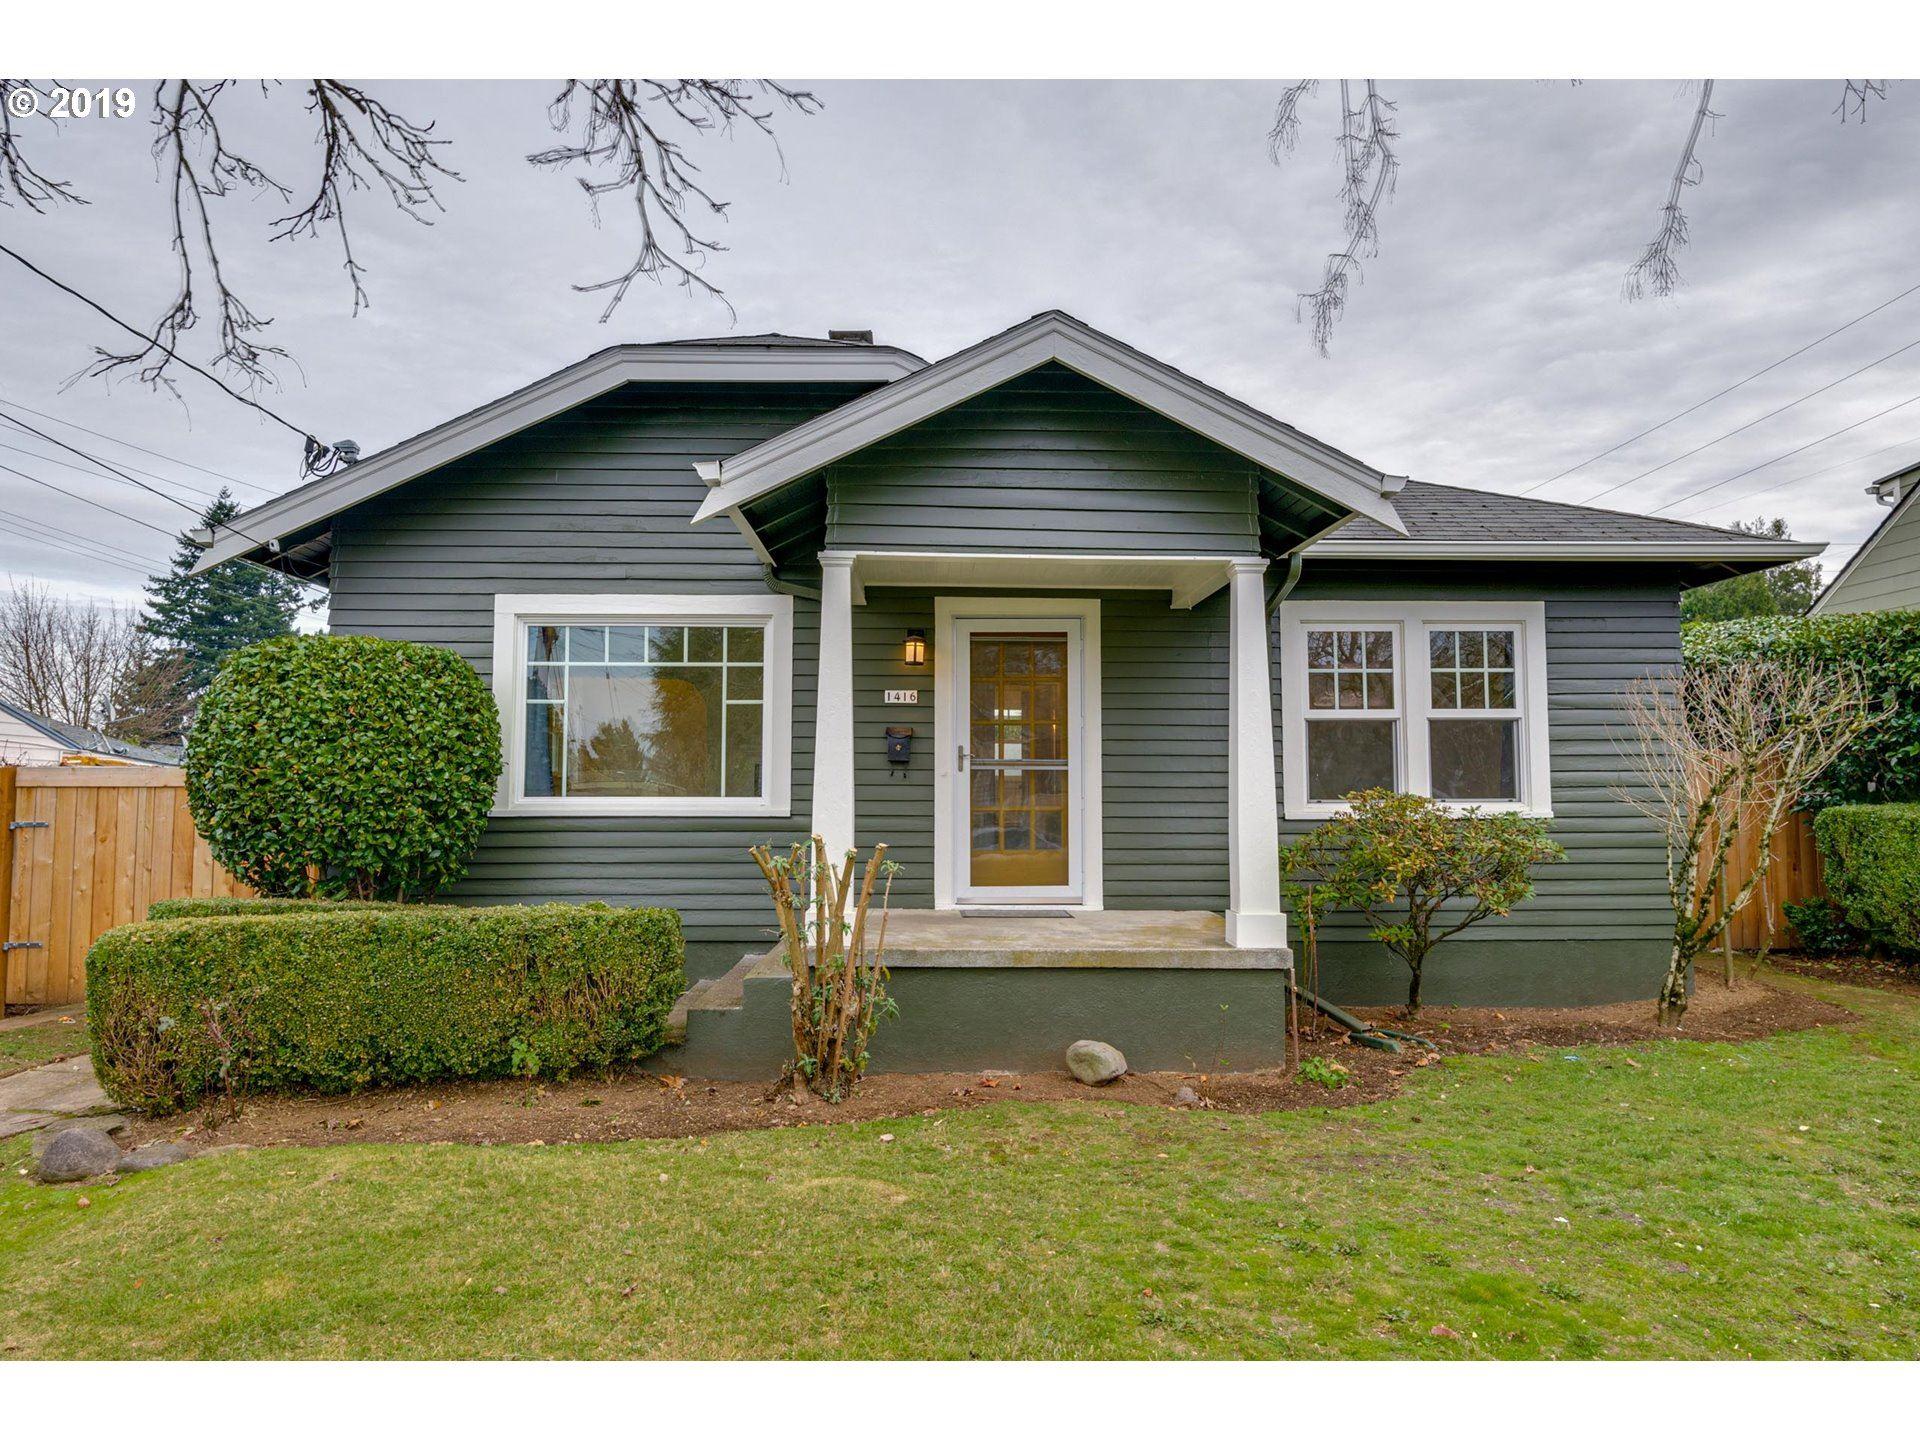 1416 NE 52ND AVE, Portland, OR 97213 - MLS#: 19616073